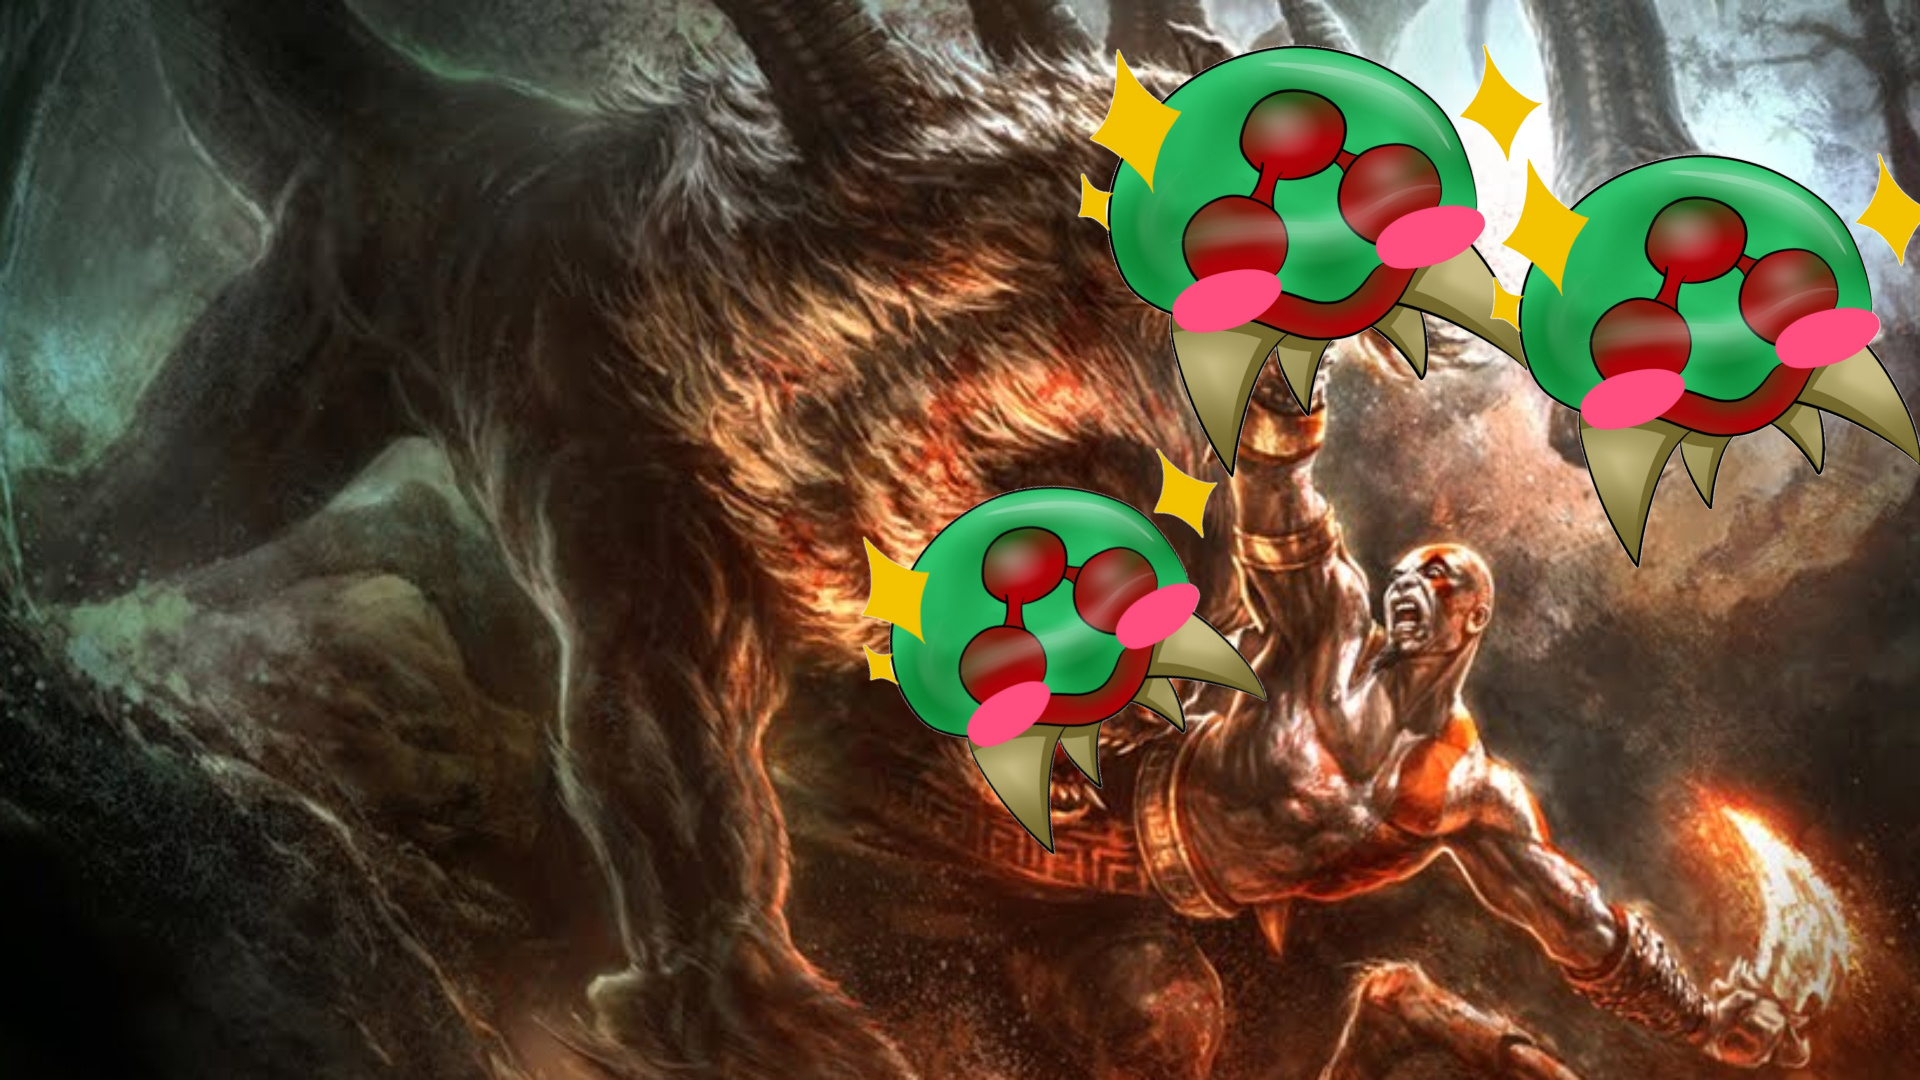 kratos-vs-cute-metroids-GamersRD